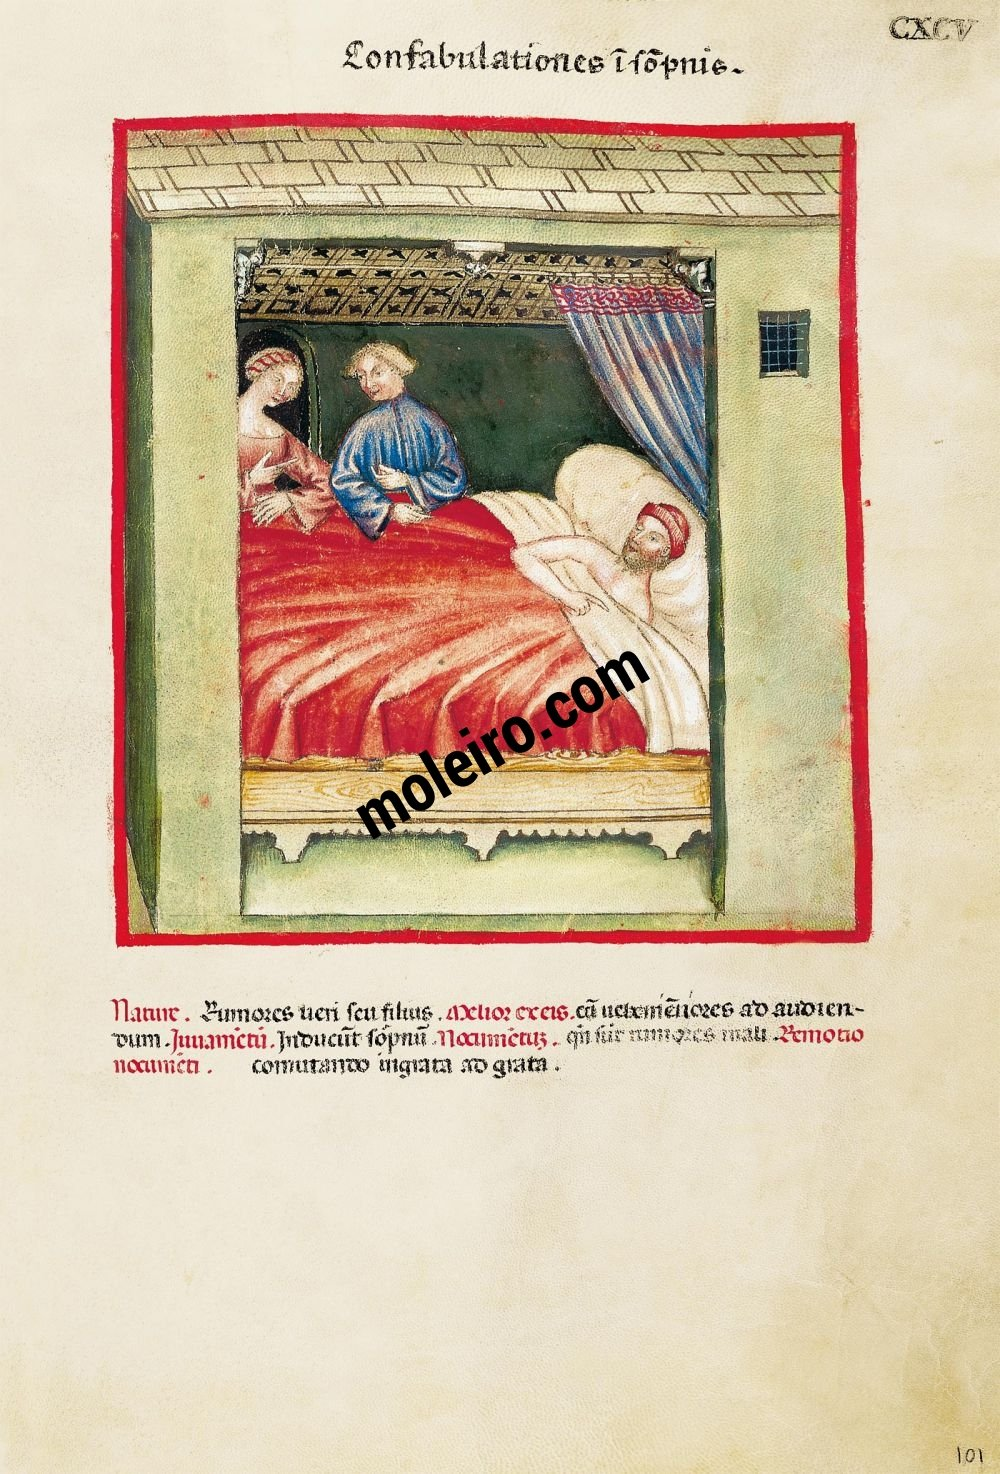 Theatrum Sanitatis f. CXCV, Conversations whilst one sleeps